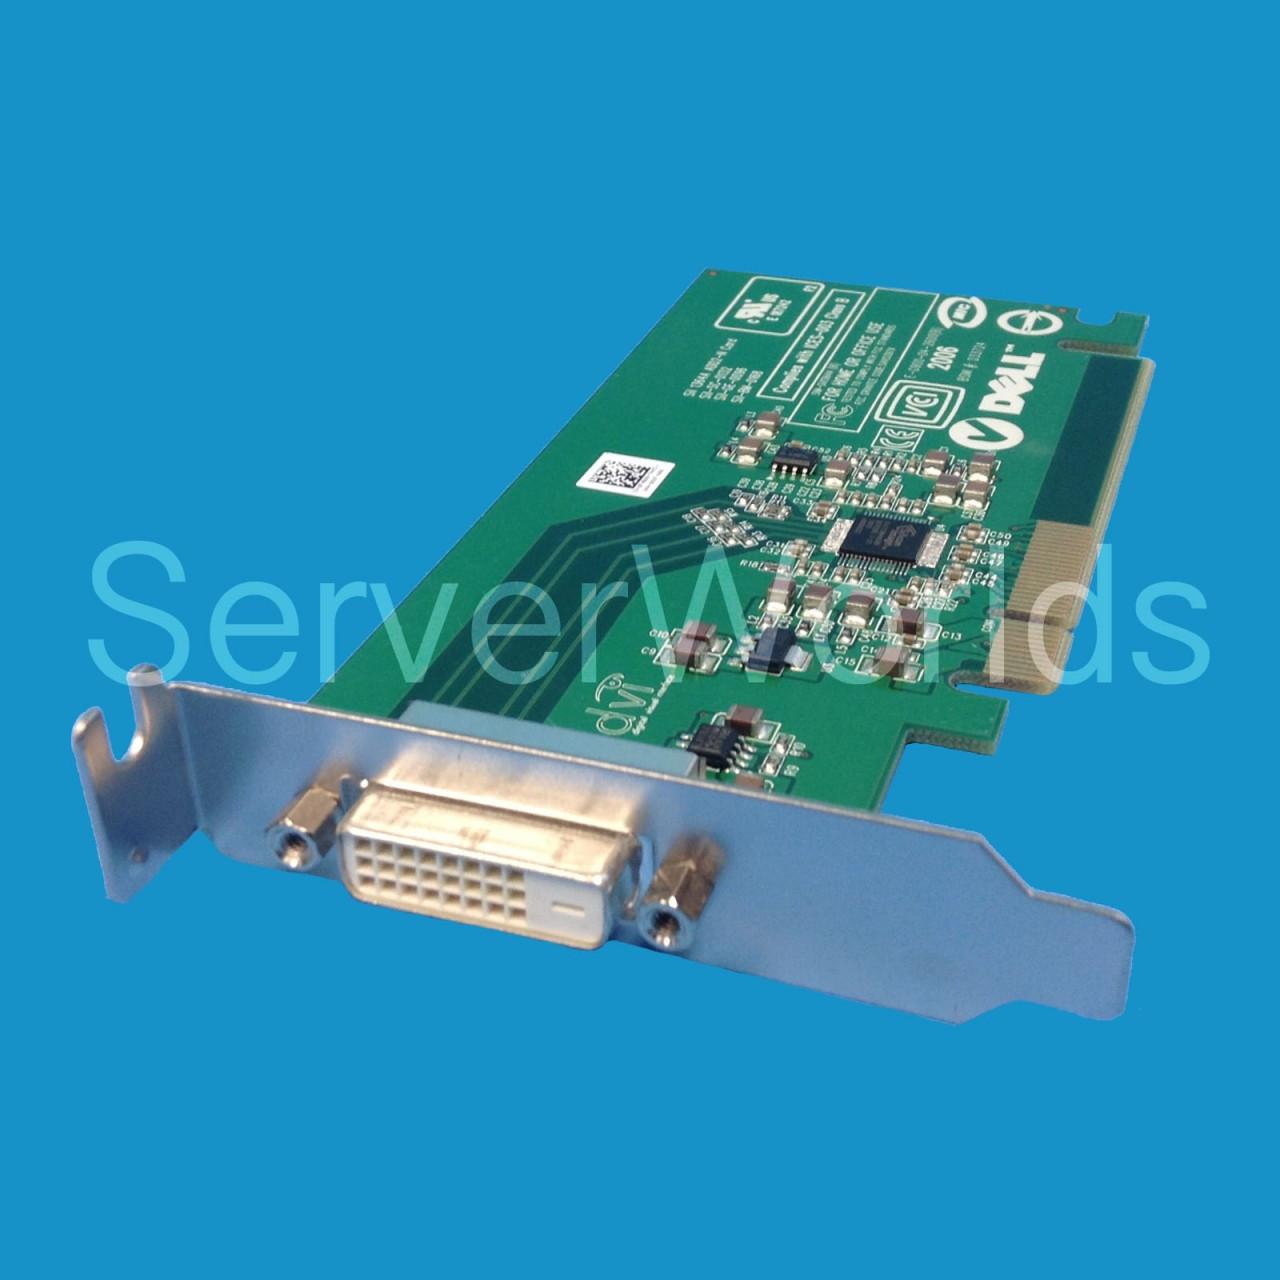 Dell FH868 | Optiplex PCIe DVI Low Profile Video Card - Serverworlds